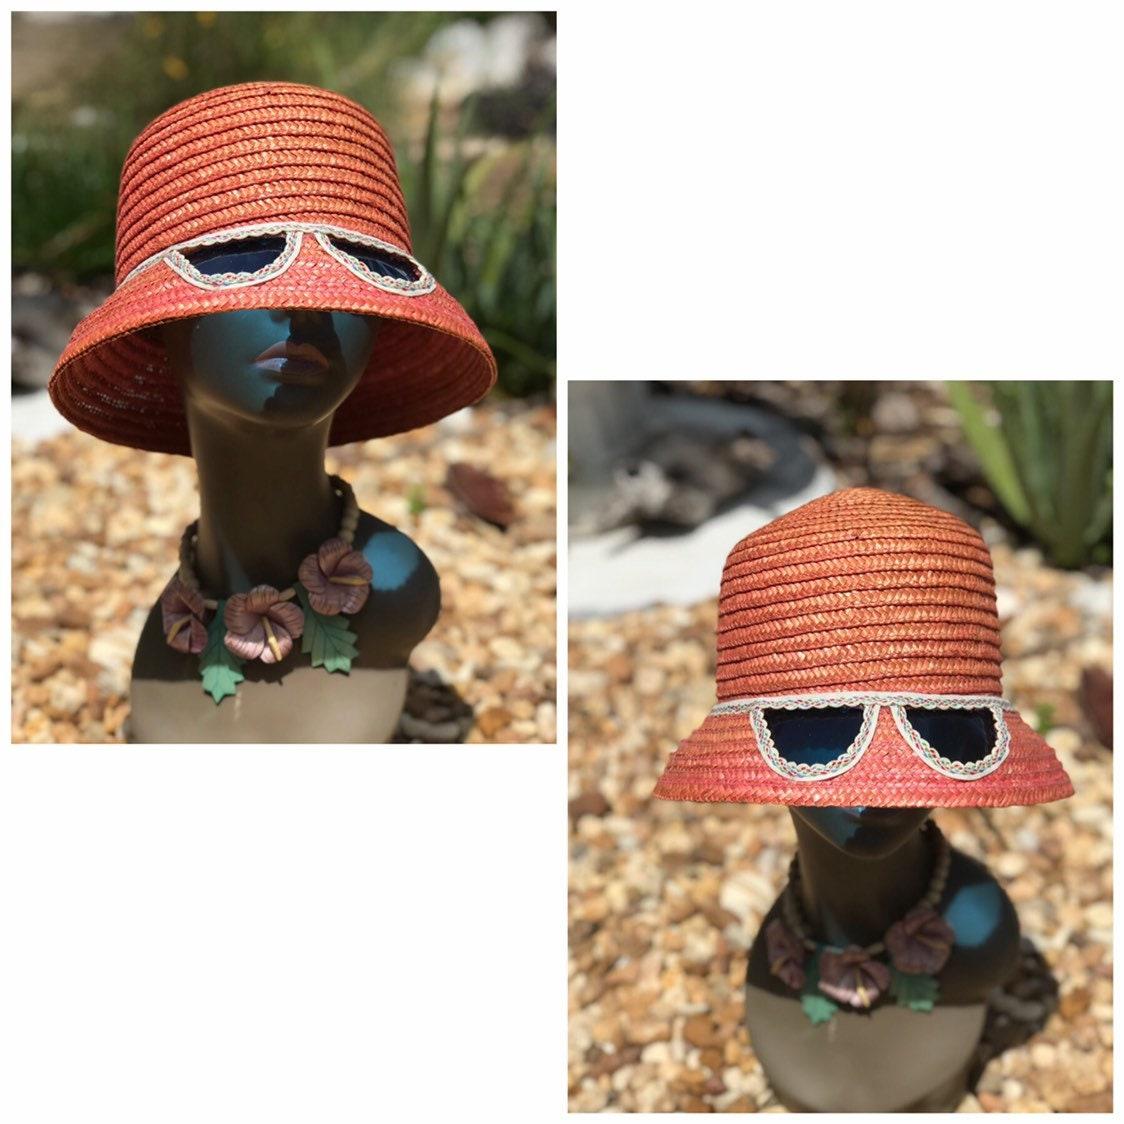 Vintage MOD Wicker Hat - Sunglass Hat - 1960s Sunhat - Bucket Hat